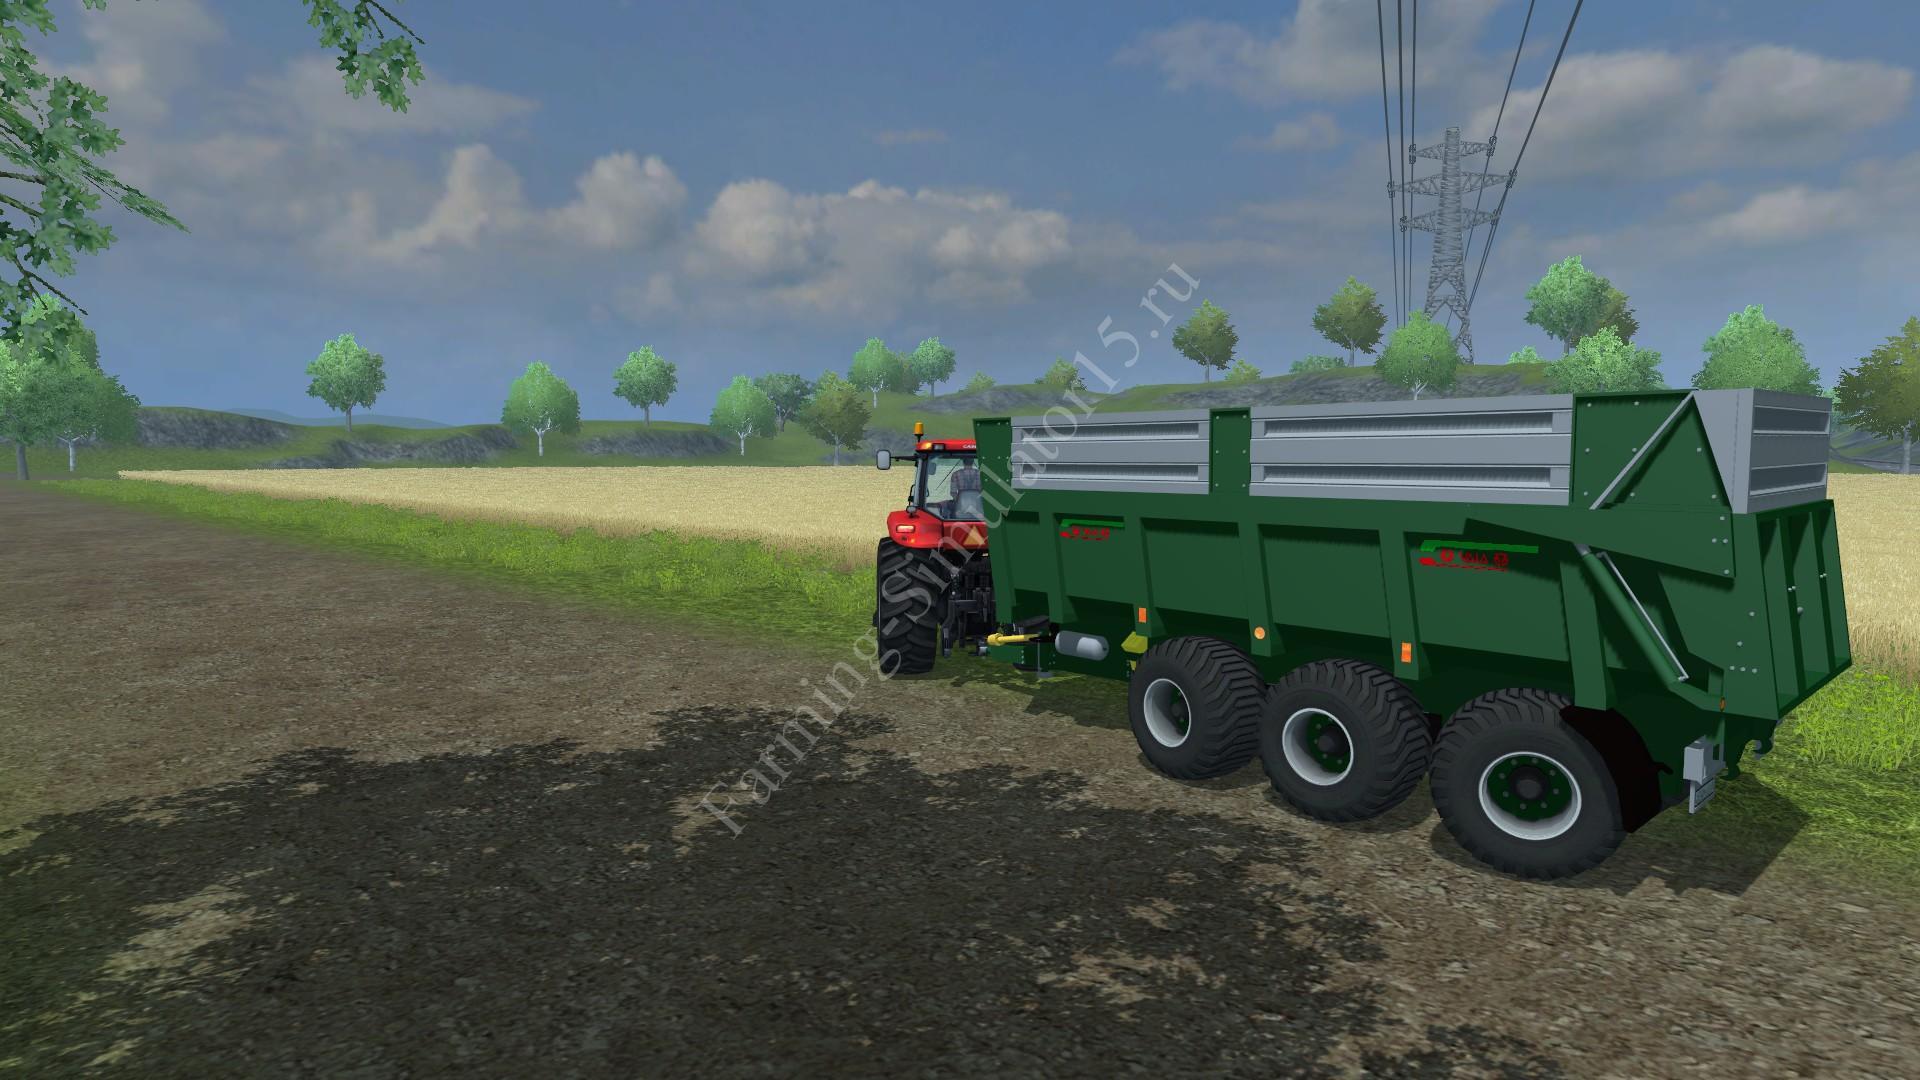 Мод трехосного прицепа Vaia NL27 Gruen v 1.0 Farming Simulator 2013, Farming Simulator 13